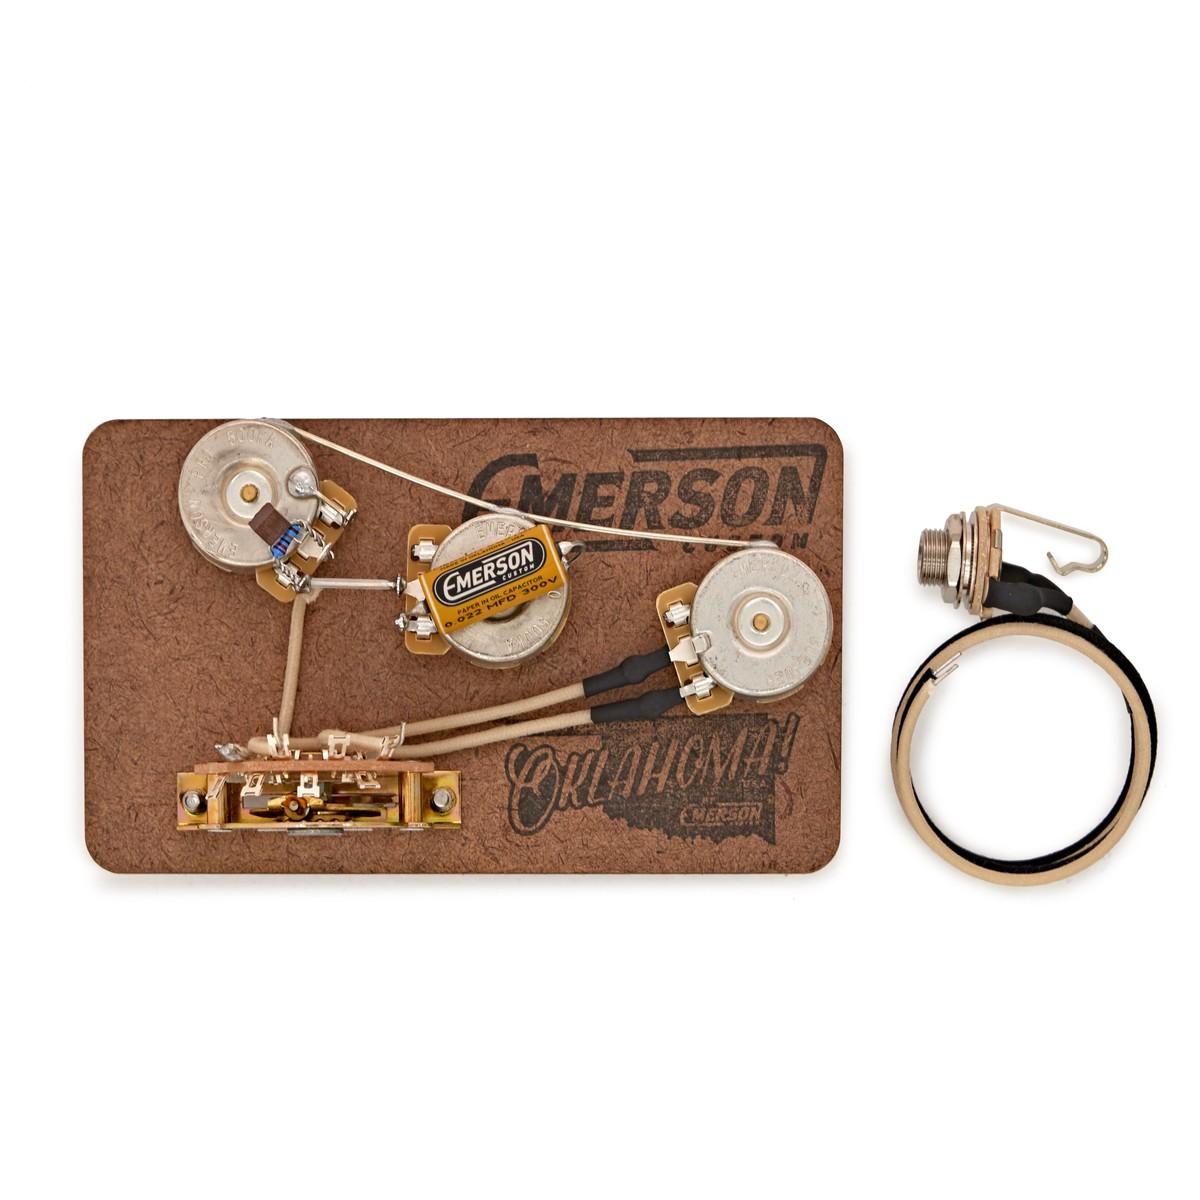 Emerson Custom 5 Way Blender Prewired Kit 500k At Gear4music Switch Wiring Diagram On Guitar 3